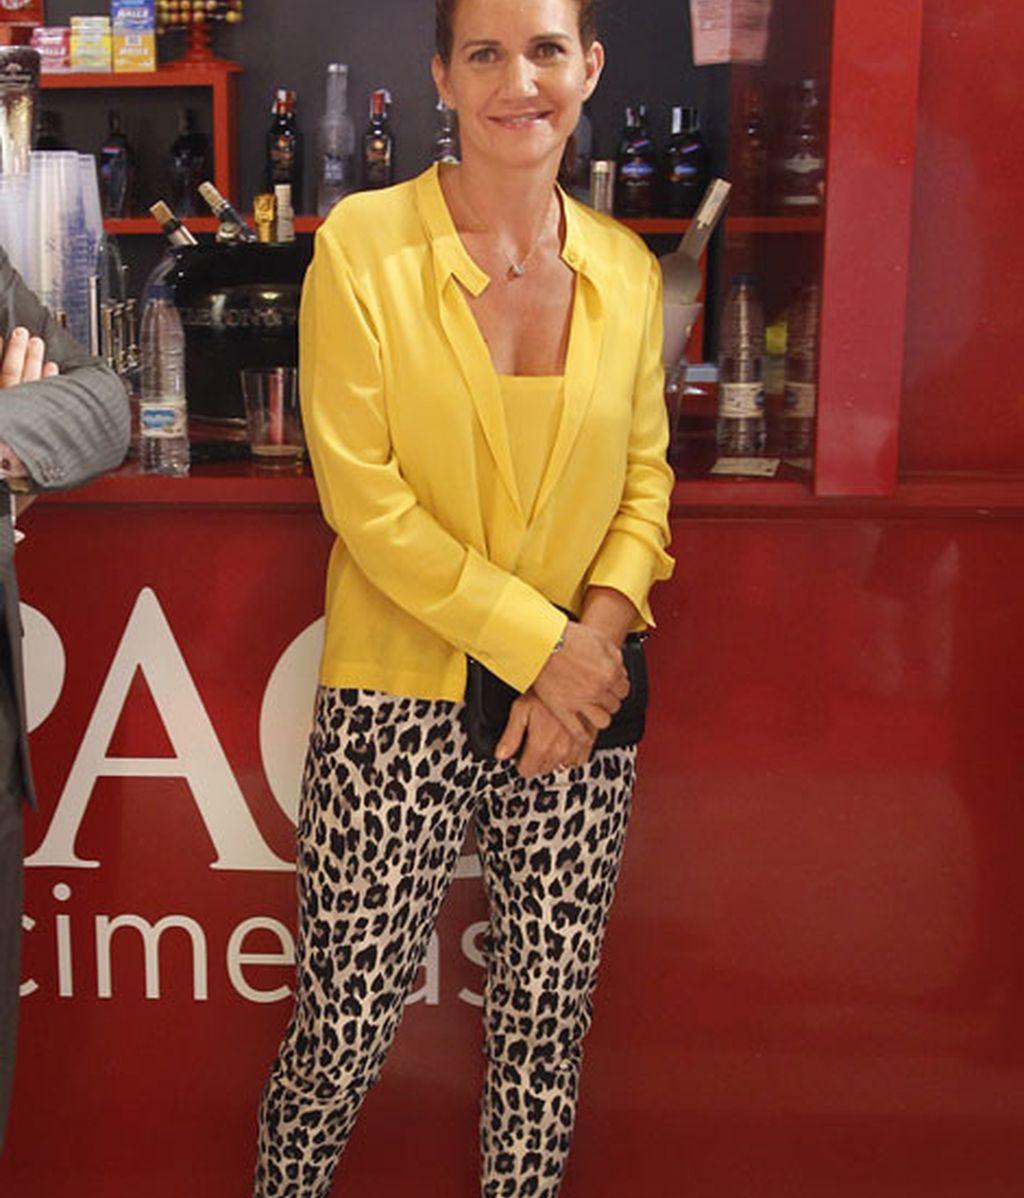 Samantha Vallejo Nagera combinó amarillo con 'animal print'